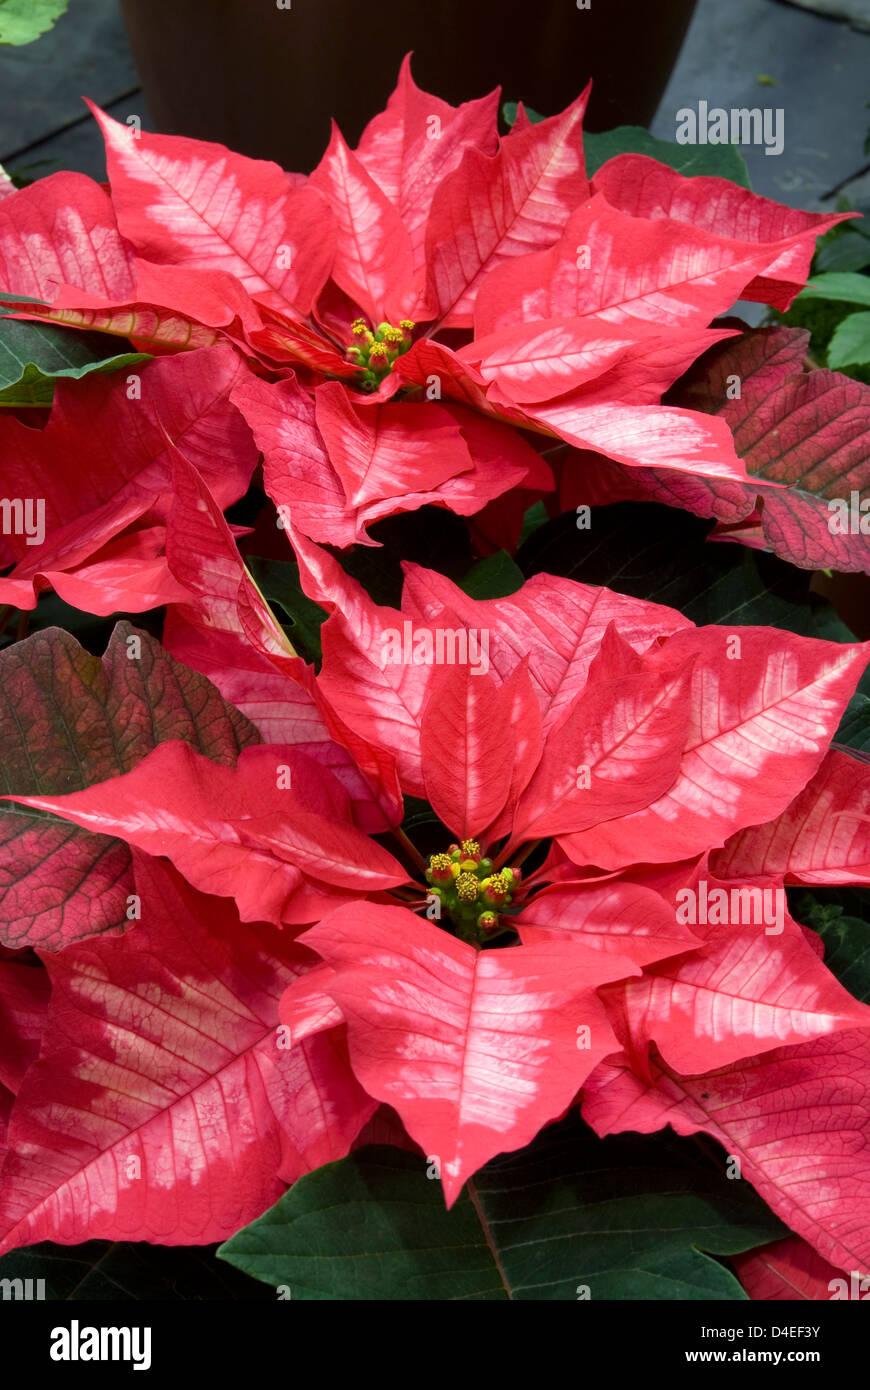 Euprbia Pulchellum Ice Punch Poinsettia Stock Photo 54408927